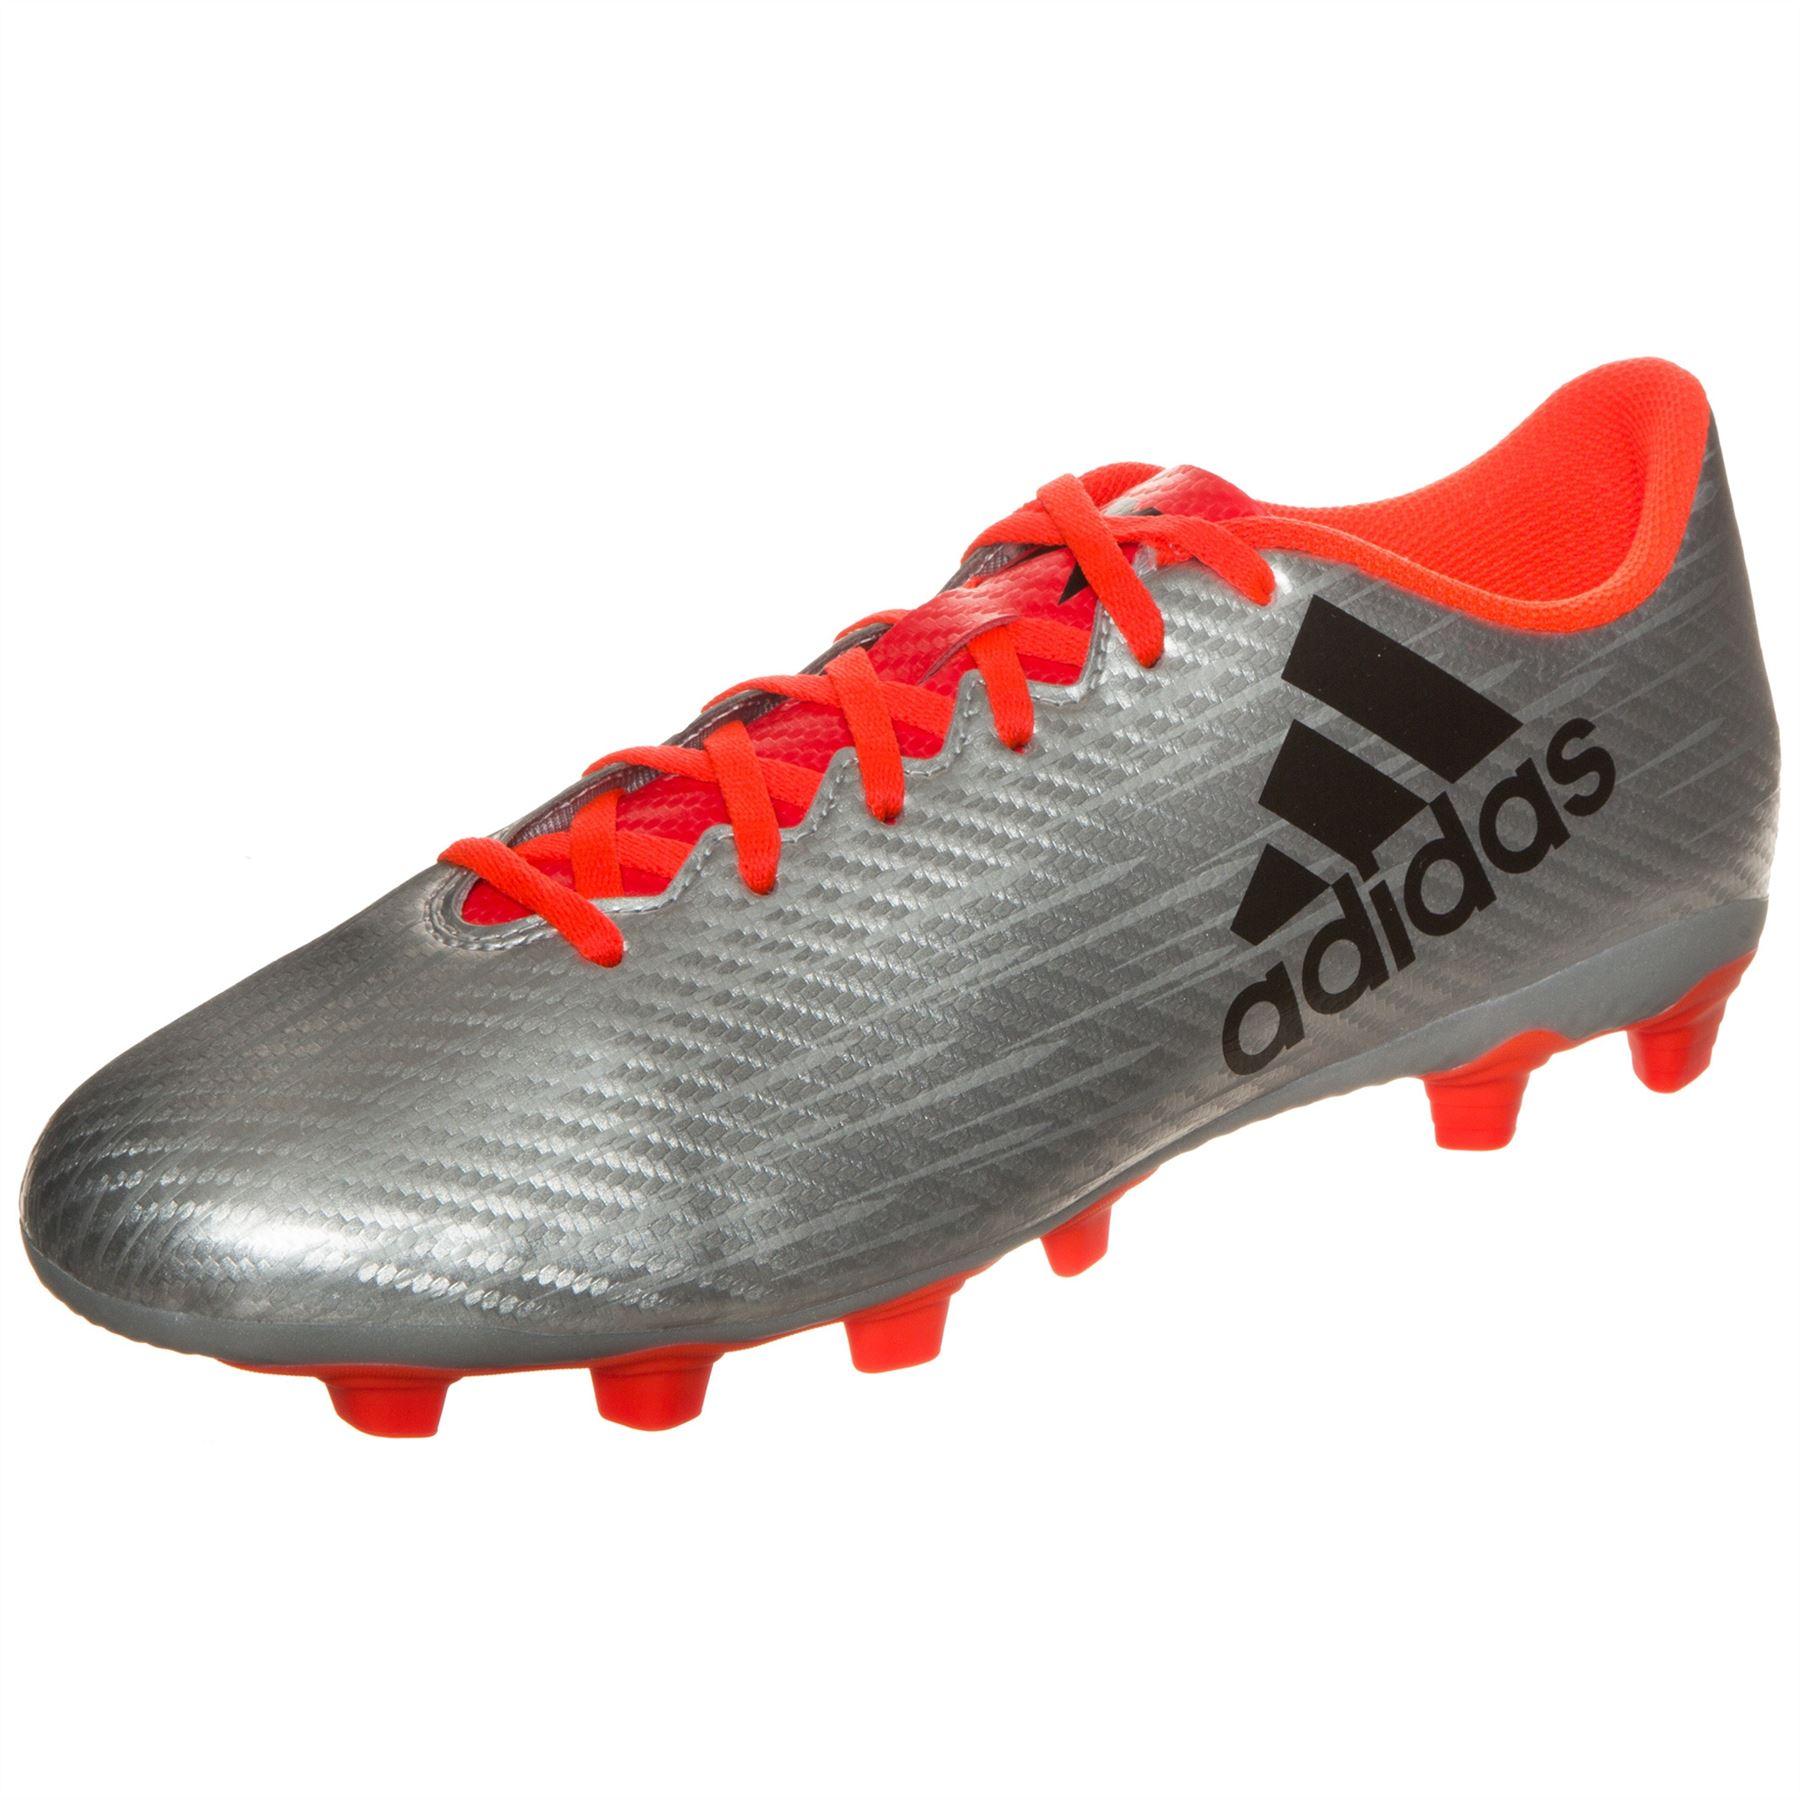 adidas x fxg scarpe da calcio terra ferma mens silver / red calcio